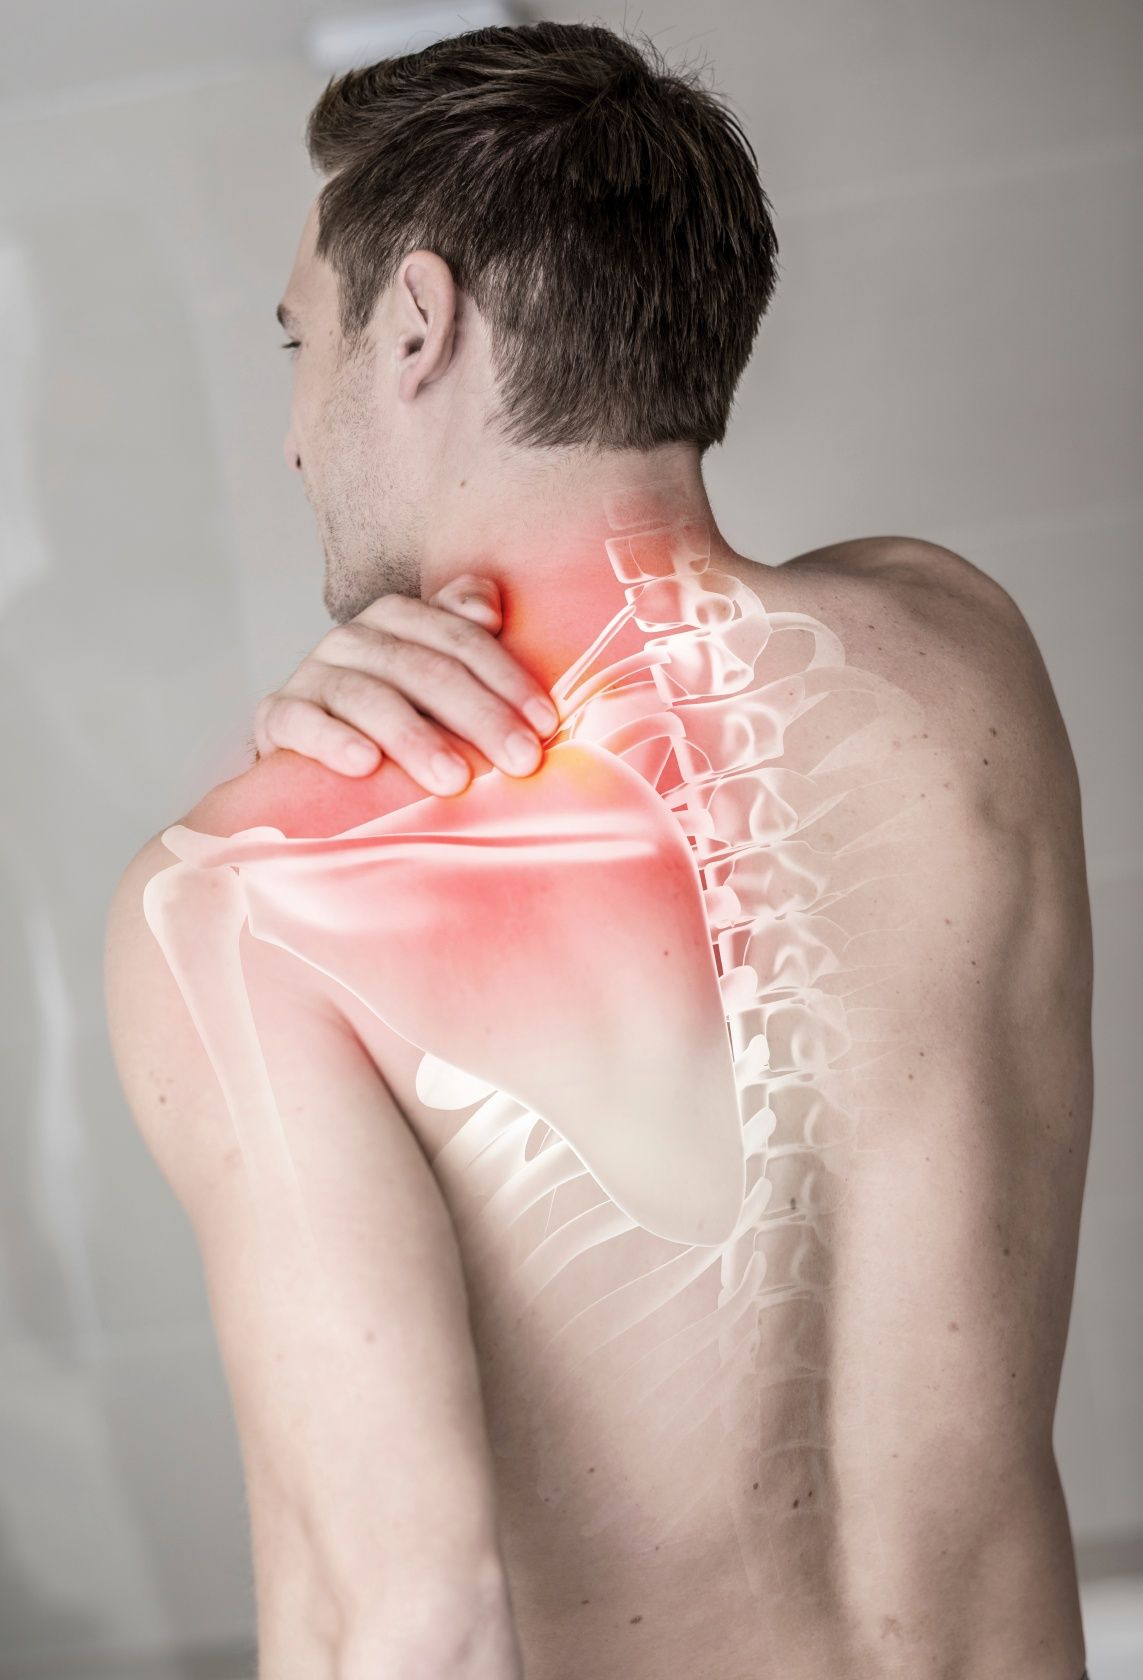 Best Chiropractic Clinic in Nashville, TN